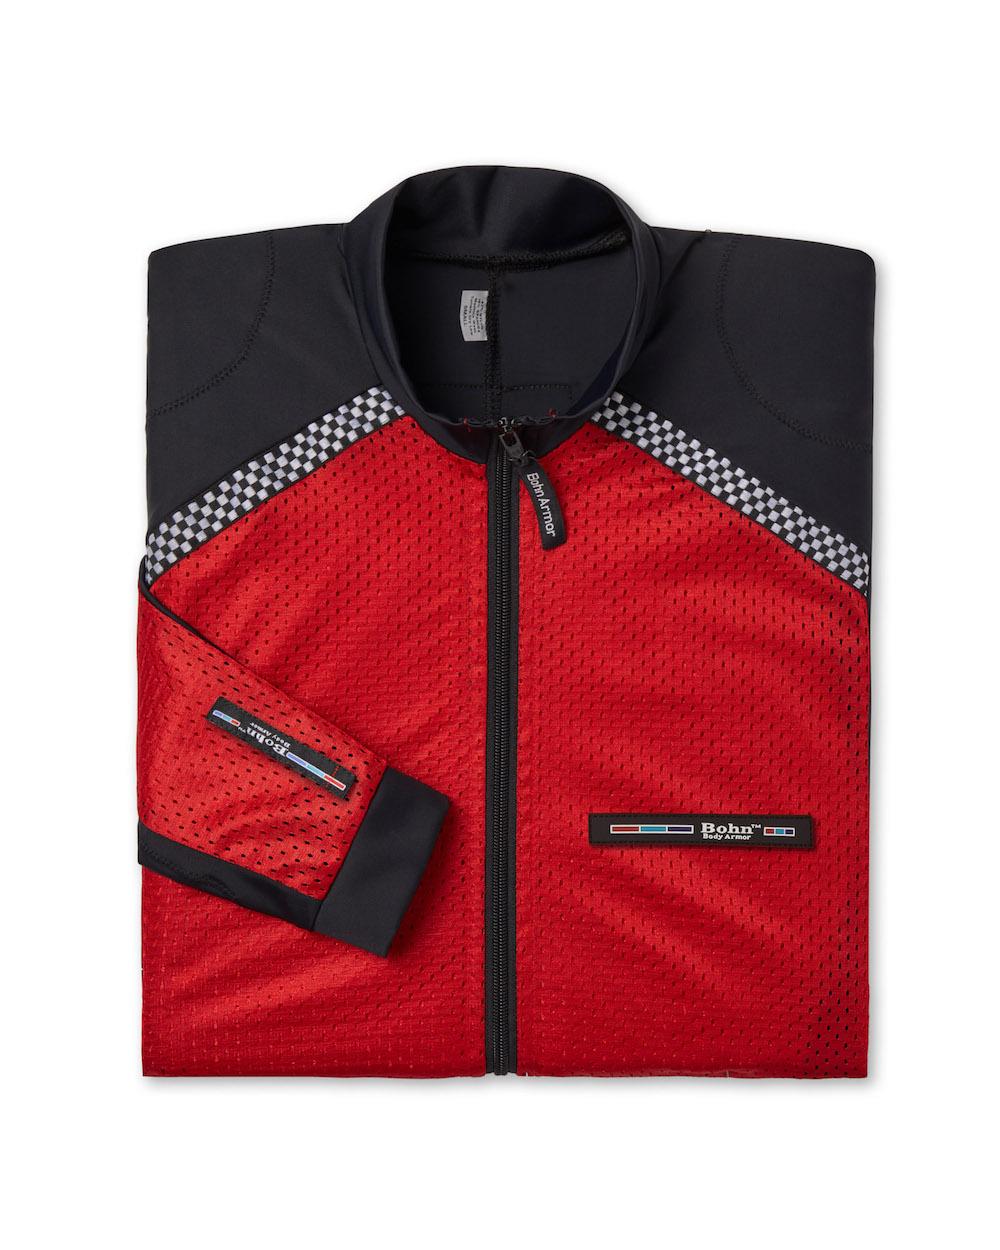 73ddce7698e All-Season Airtex Riding Shirt Shell - Red + Black